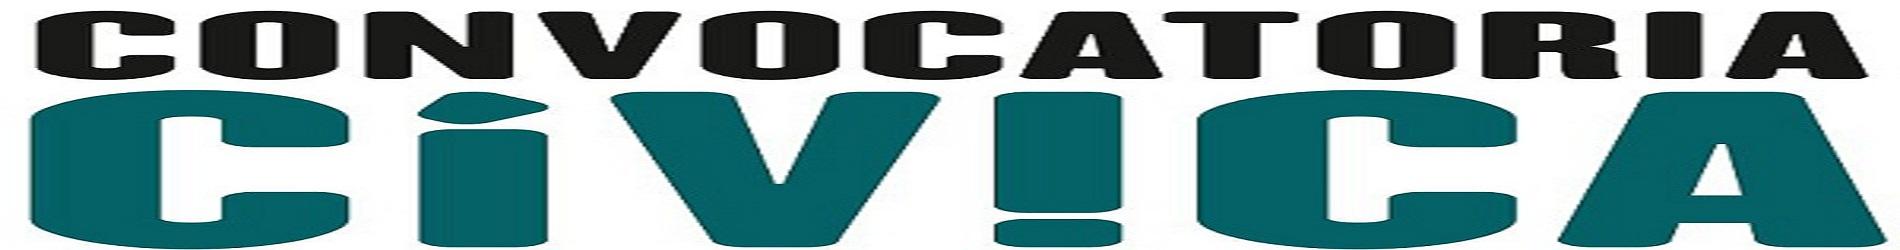 logo CC 1900 x 250